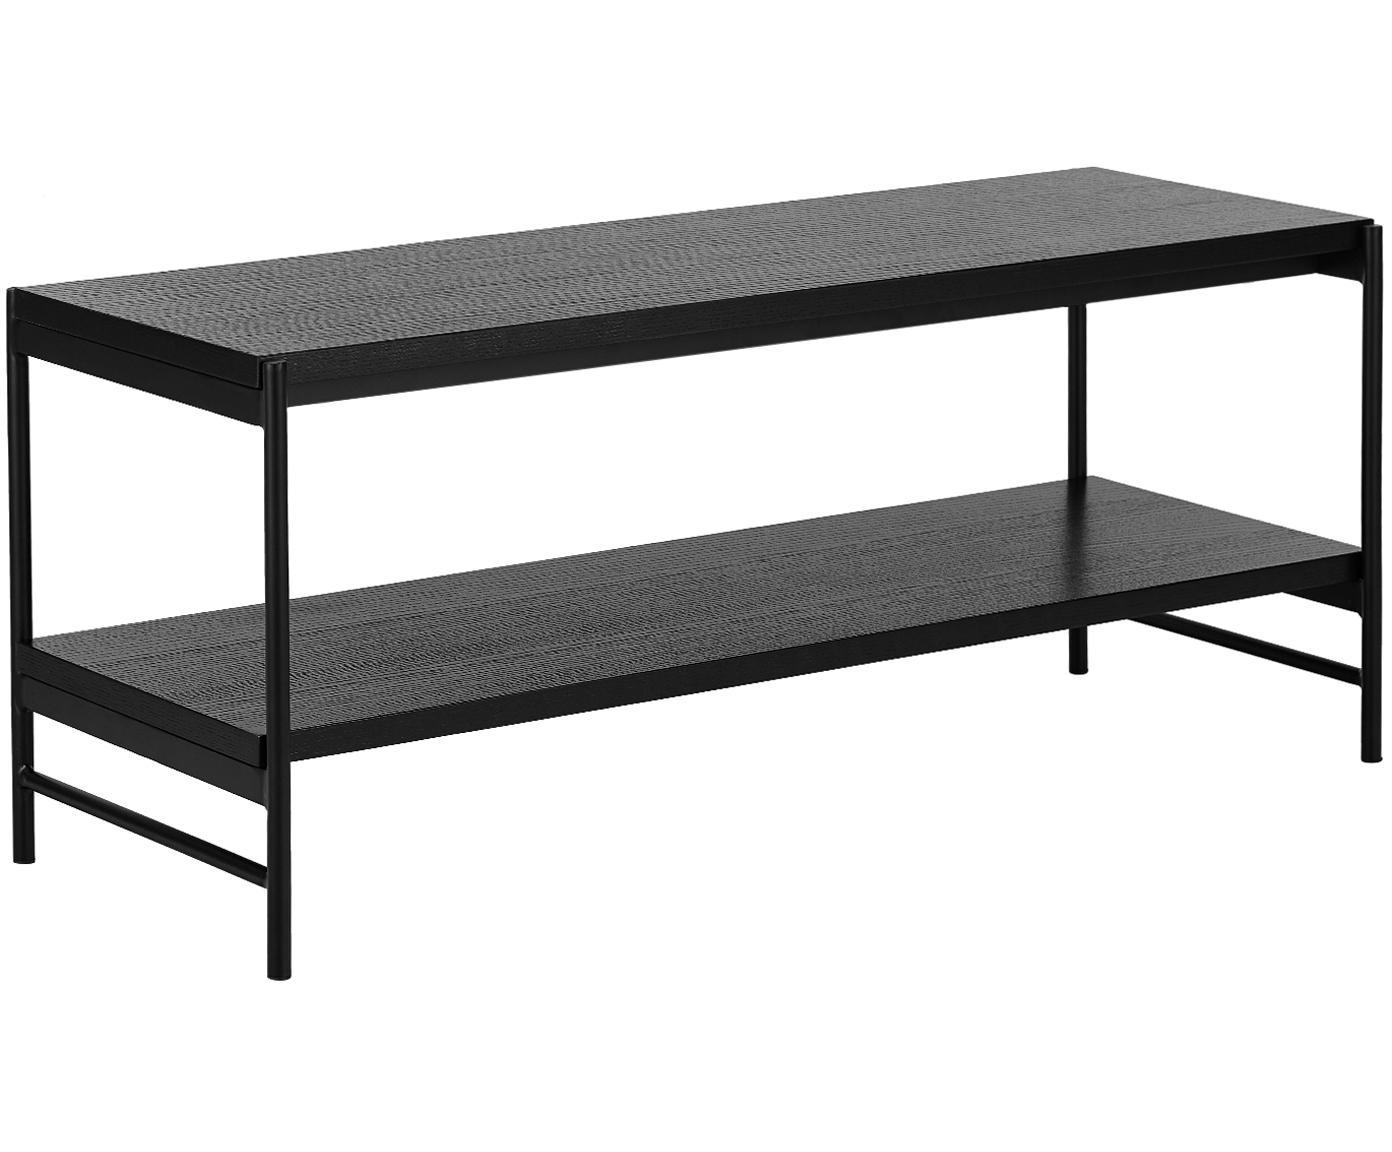 Aparador Mica, 2 estantes, Estantes: tablero de fibras de dens, Estructura: metal con pintura en polv, Negro, An 120 x Al 50 cm